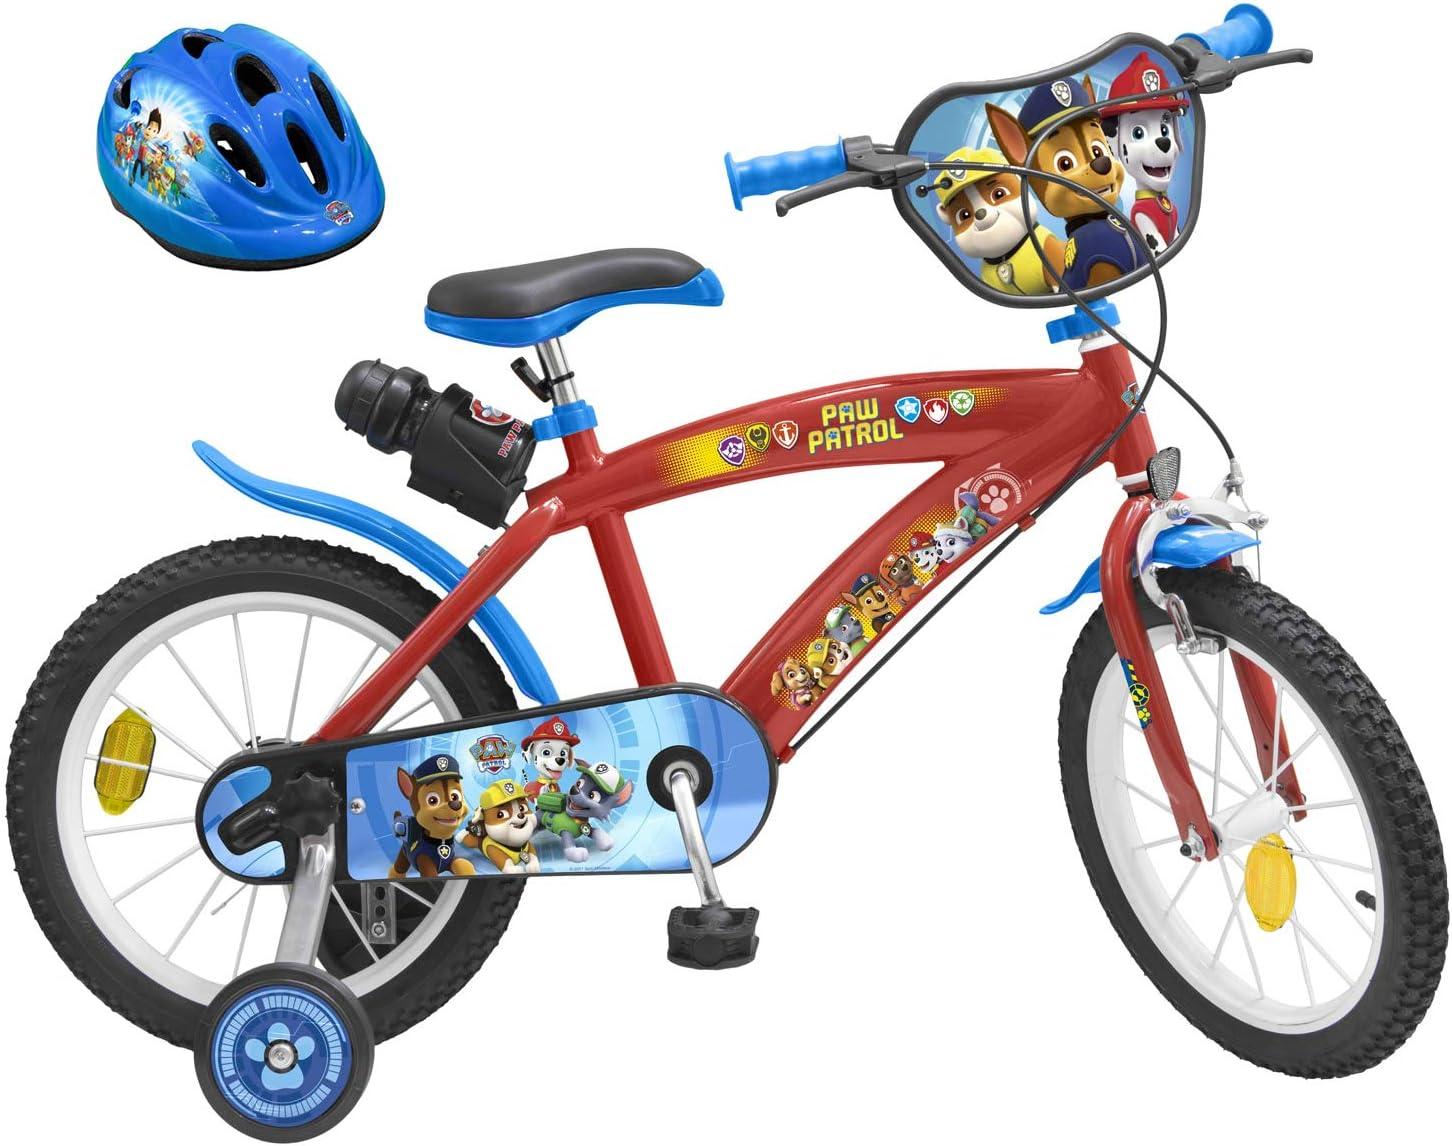 PAW PATROL Kinderfahrrad 16 Zoll 52-56 cm Fahrradhelm Gr Felgenbremse Trommelbremse Trinkflasche